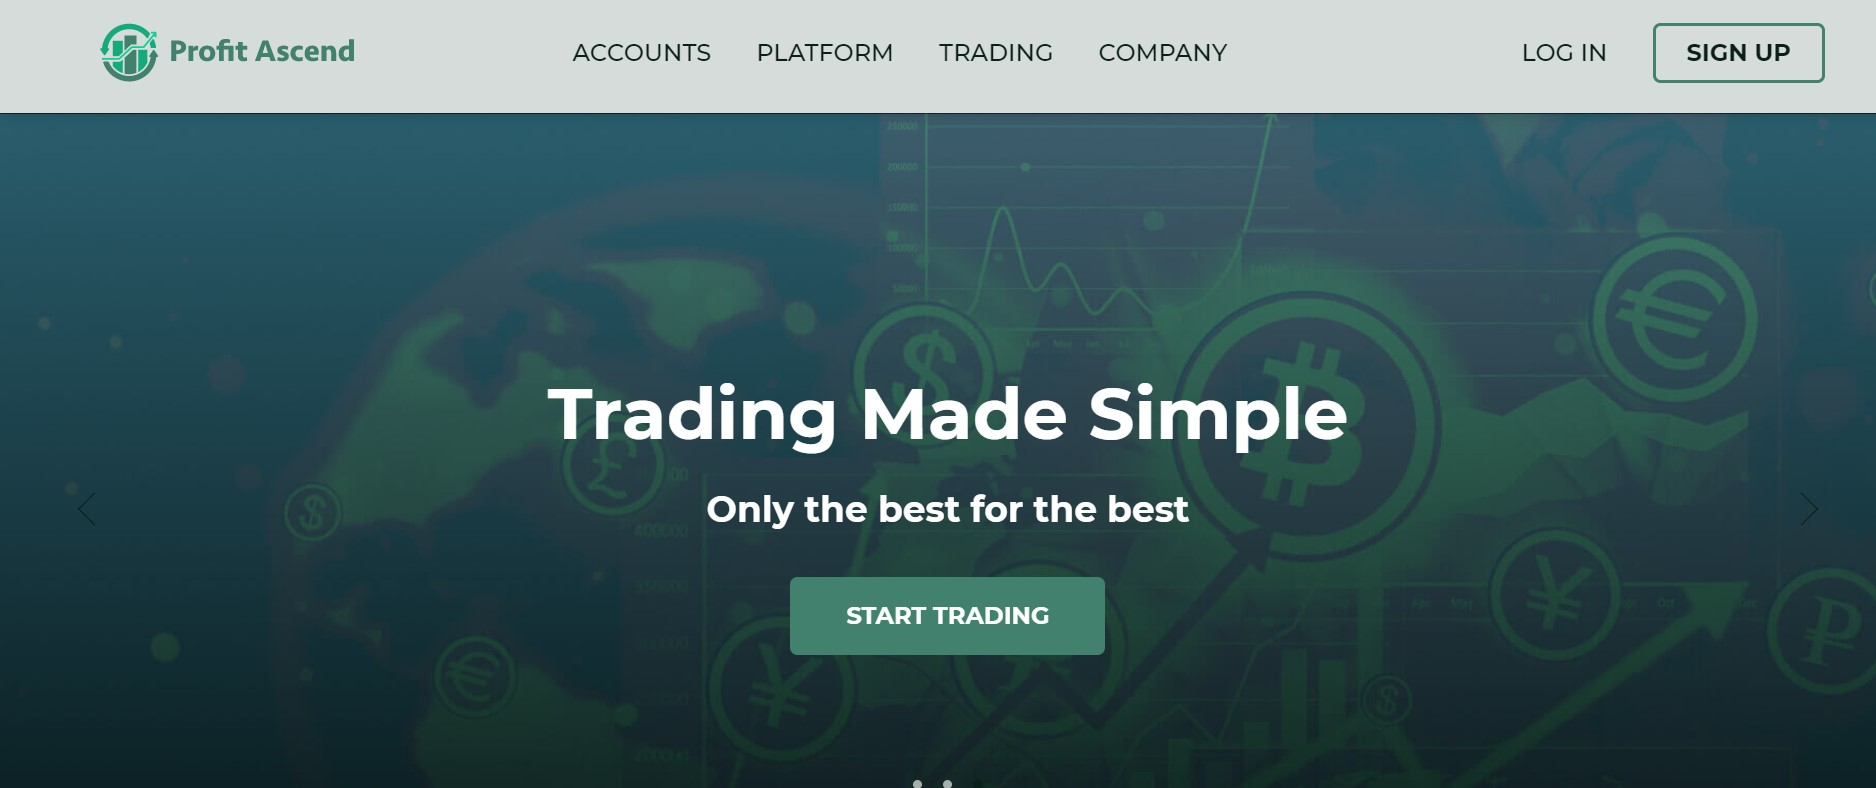 Profit Ascend website